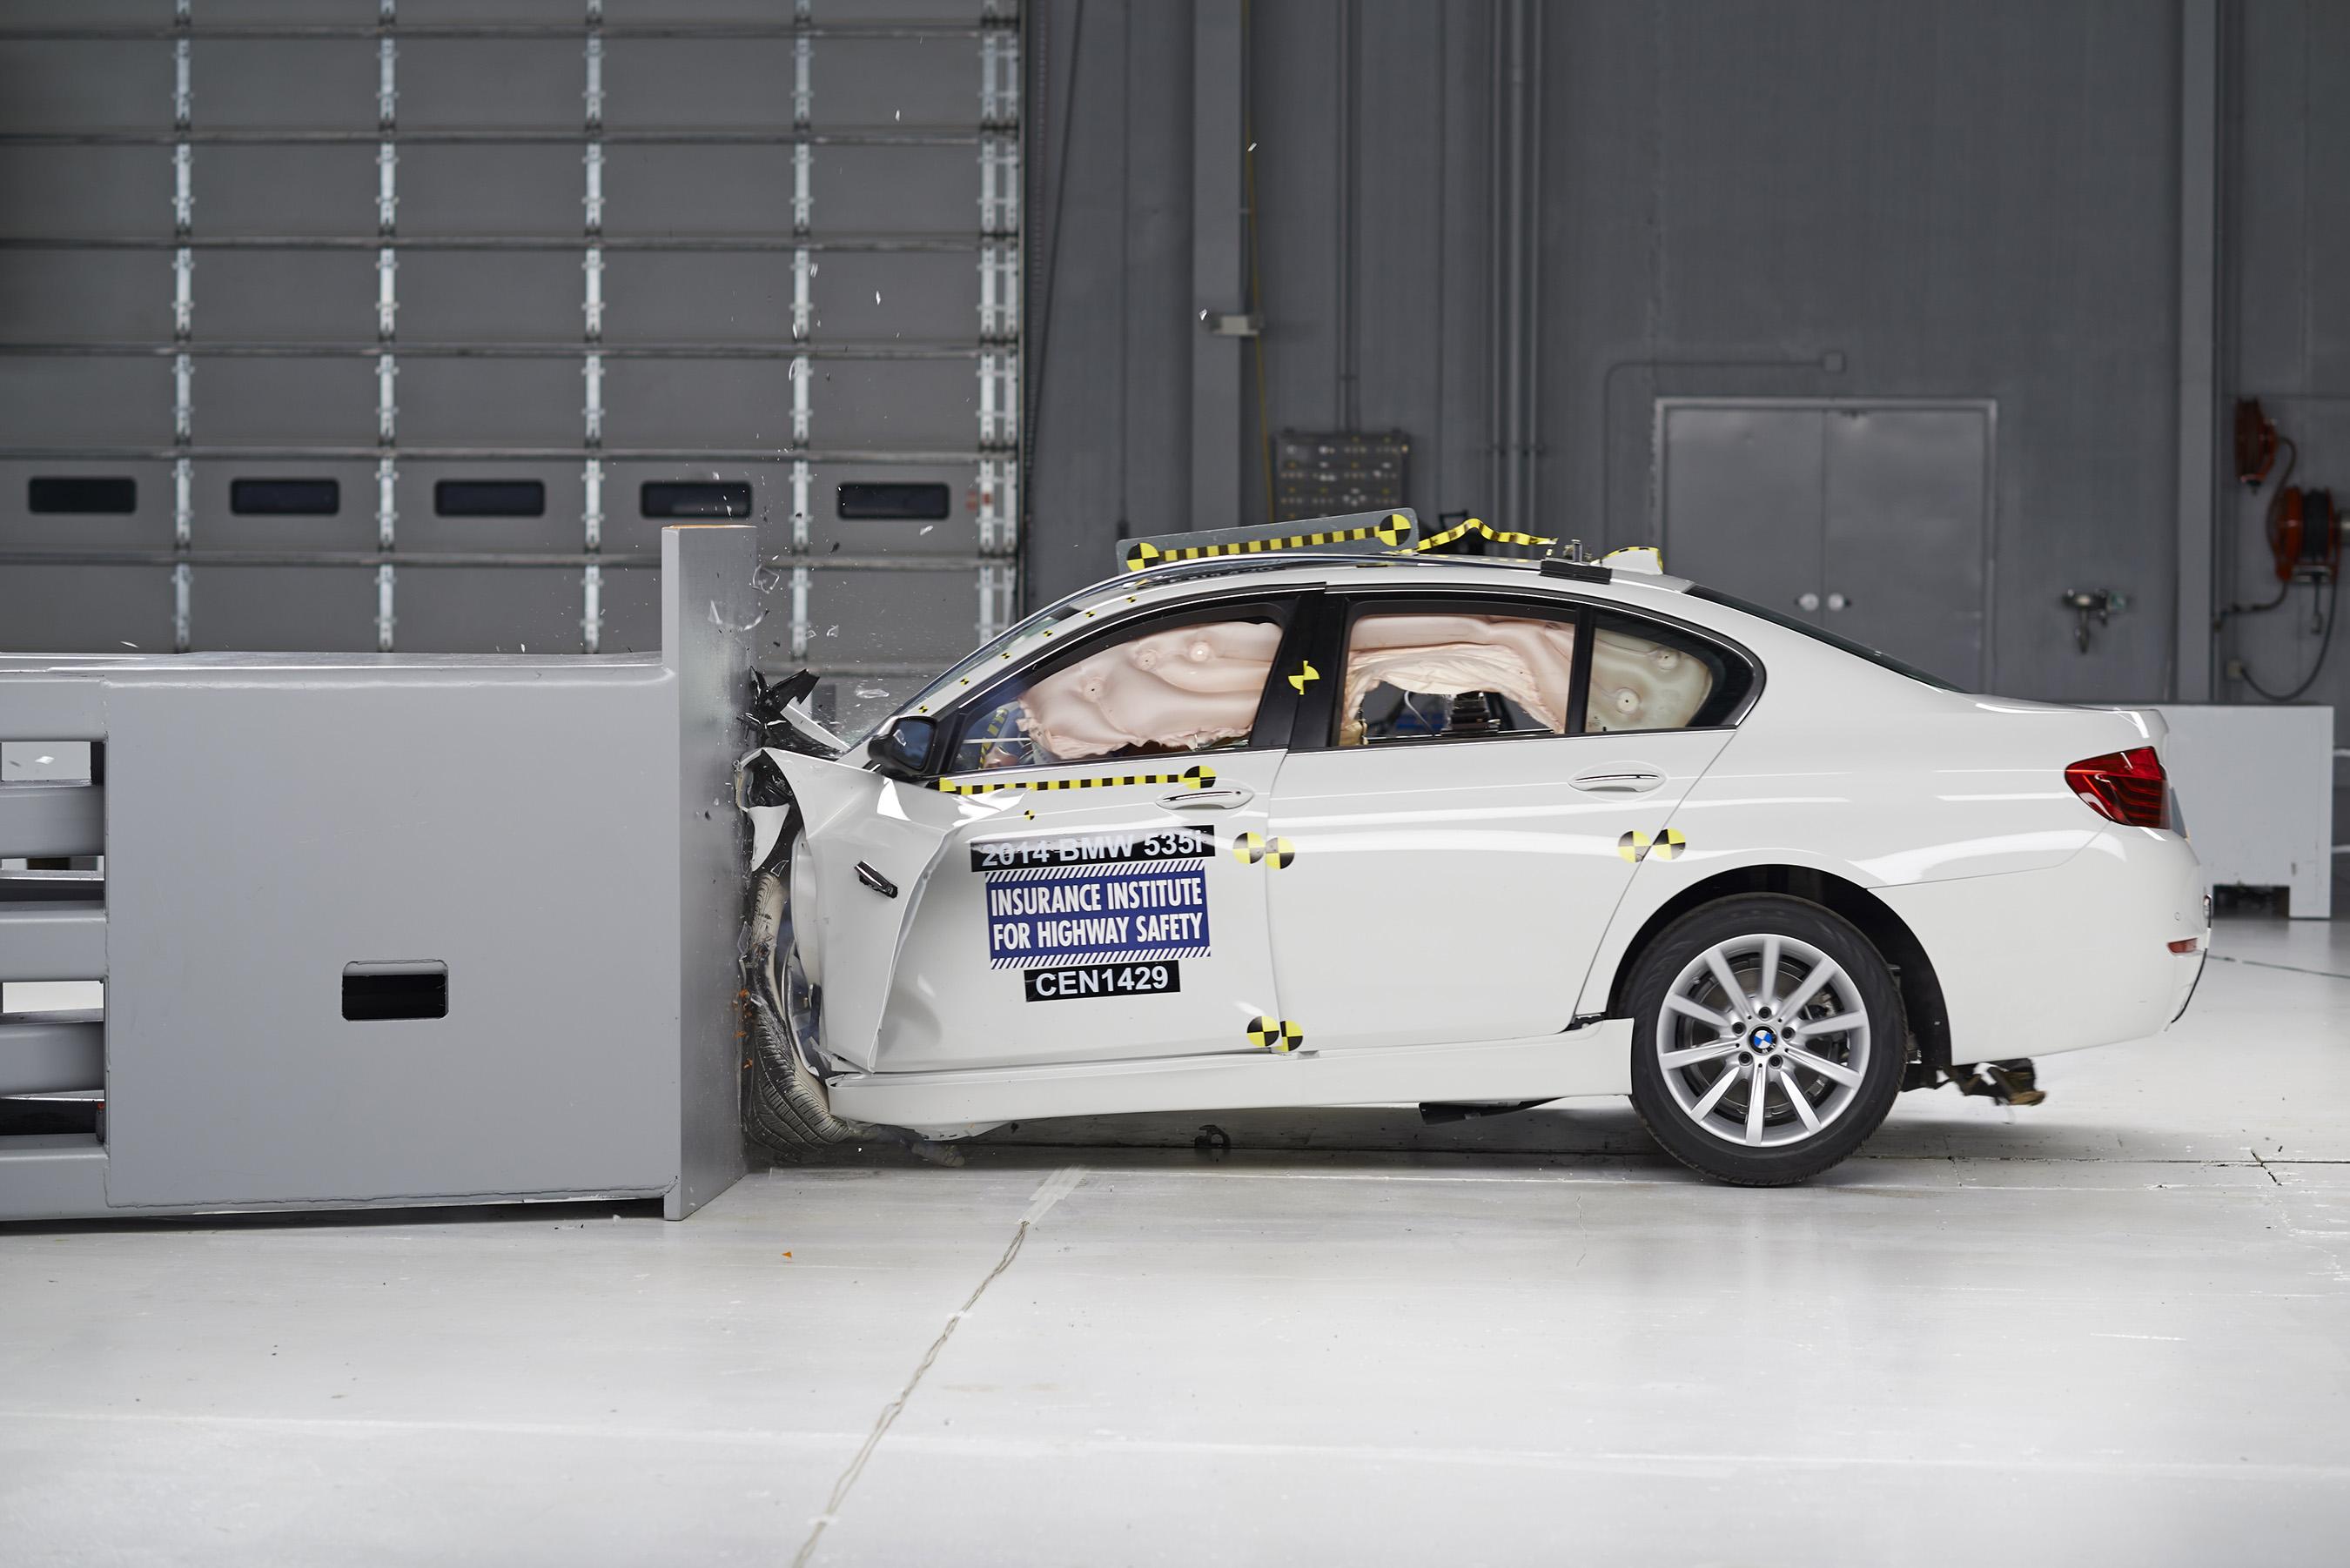 2014 BWM 5 Series small overlap IIHS crash test – MARGINAL rating